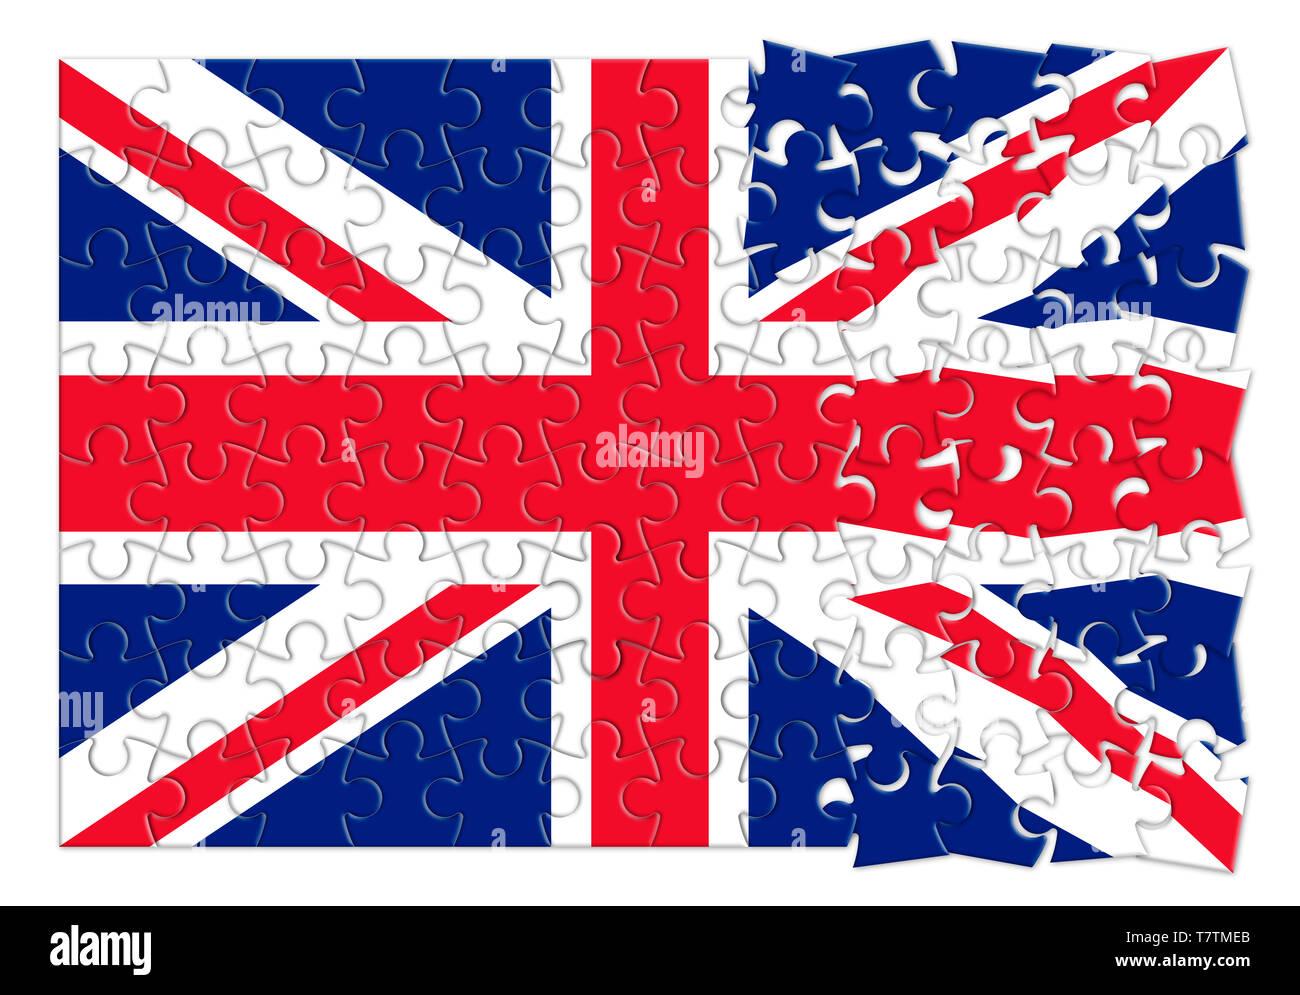 Rebuild england - concept image in puzzle shape Stock Photo